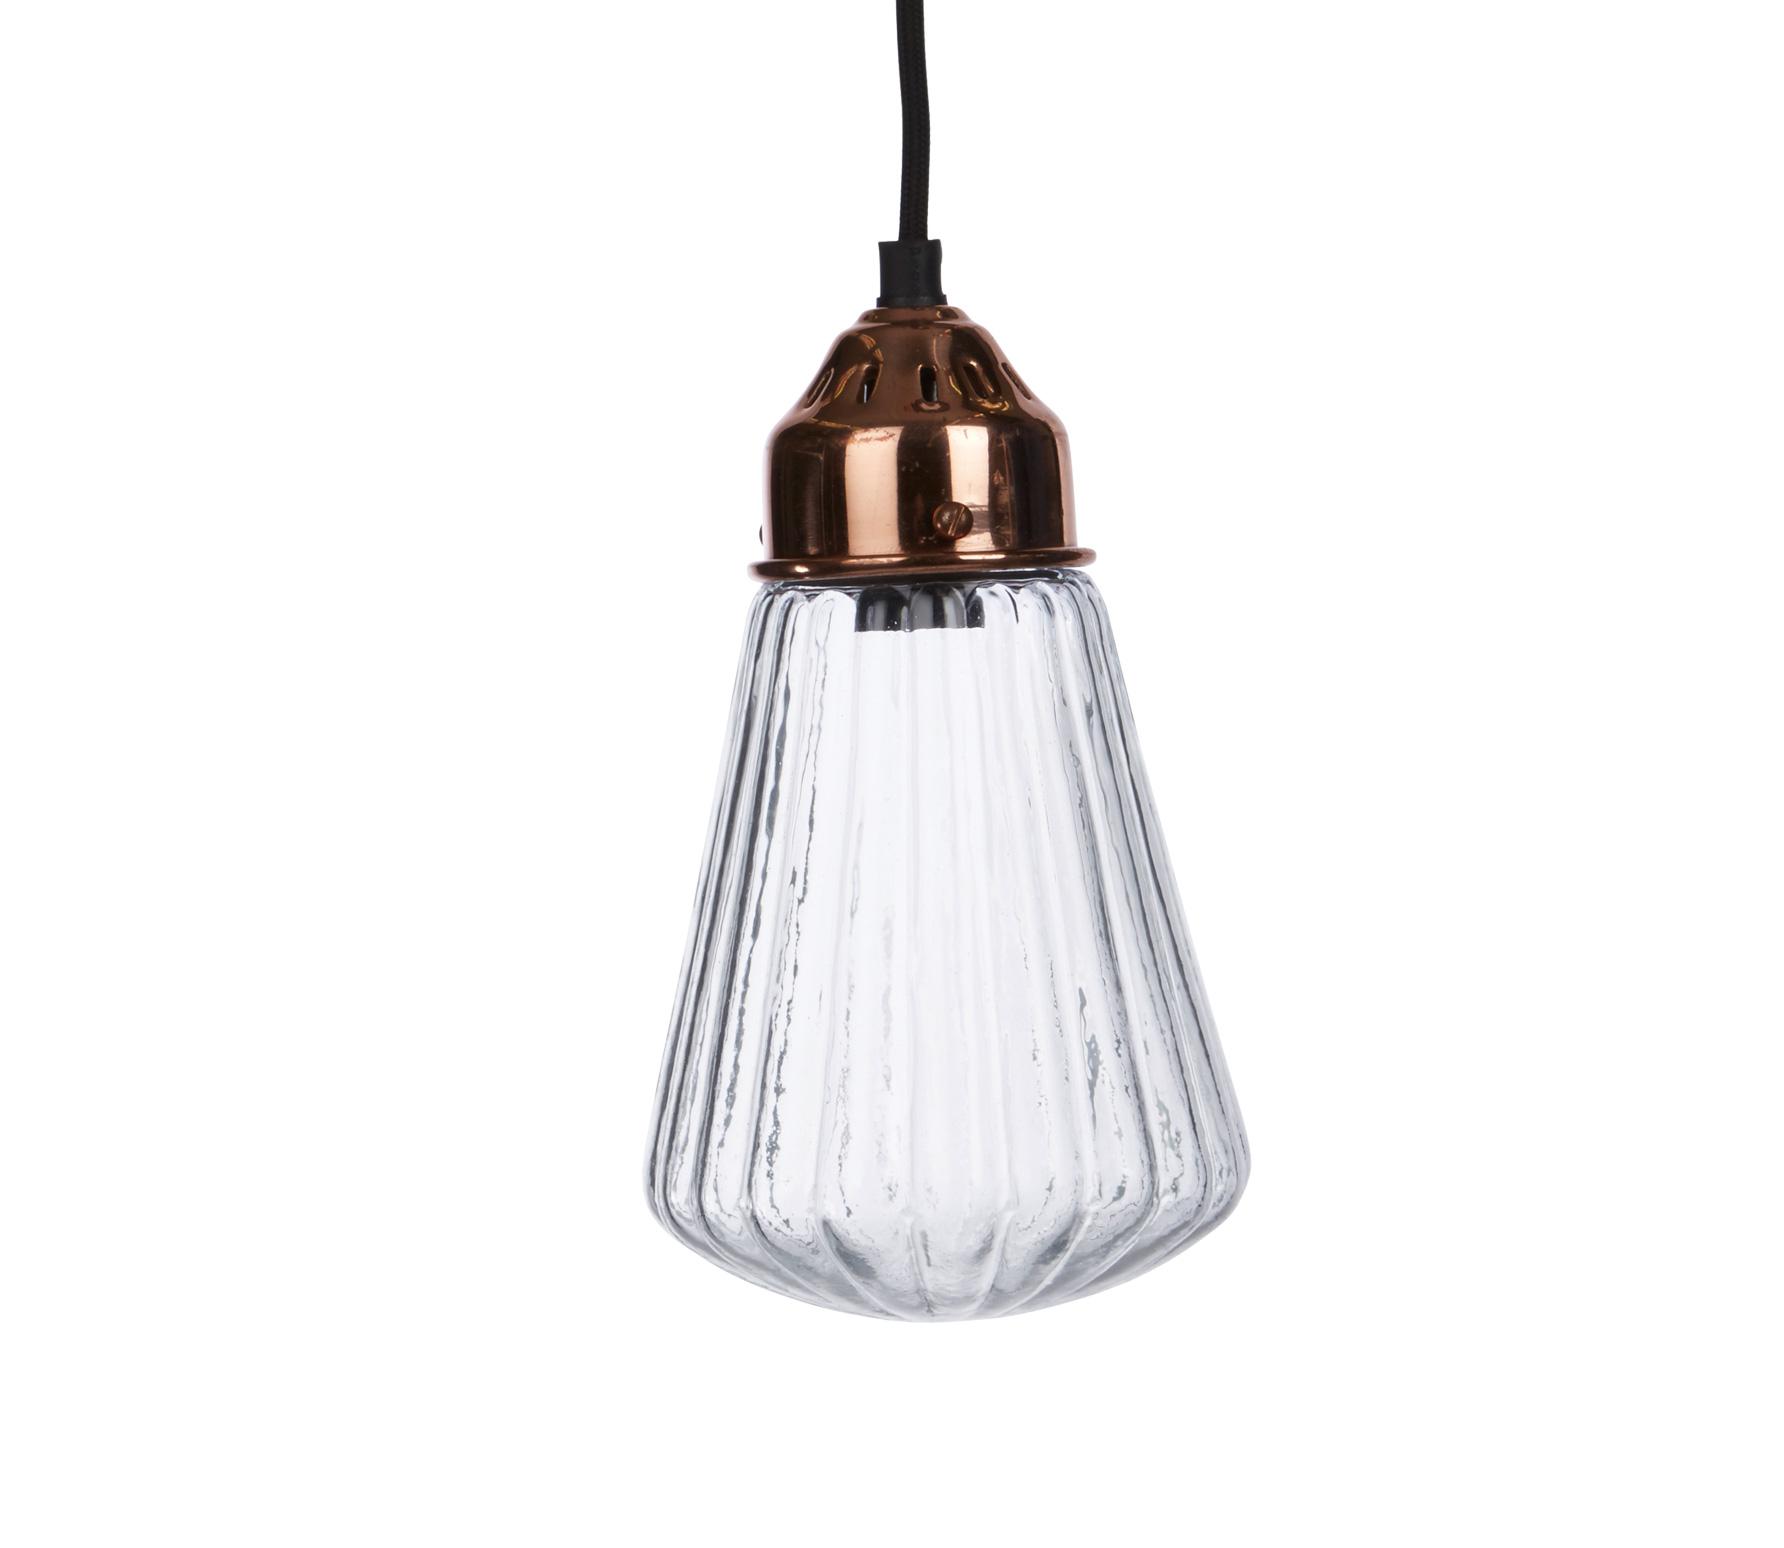 Pliage hanglamp Ø12 cm glas/metaal antiek koper